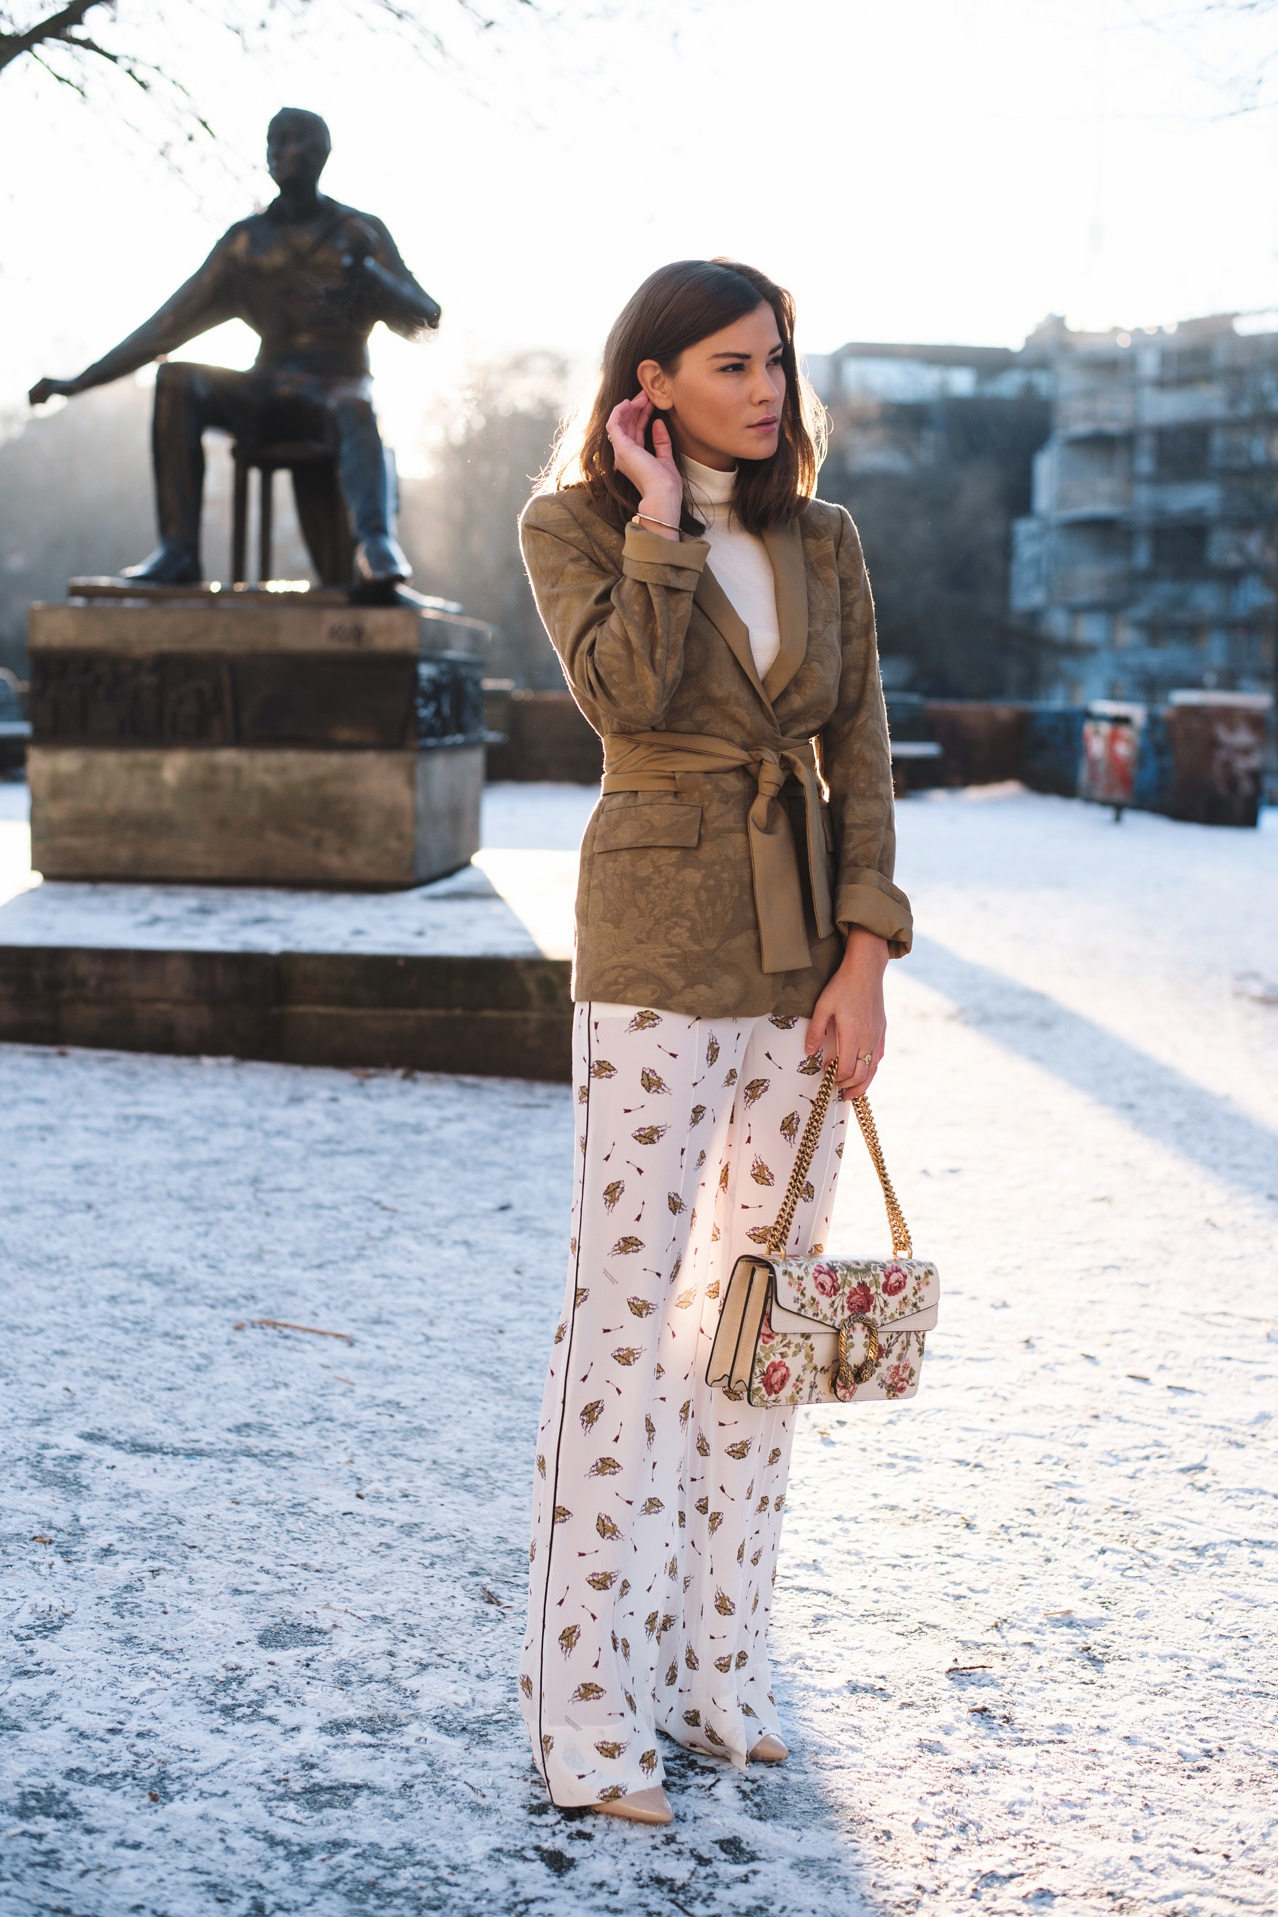 german-fashion-and-lifestyle-blog-munich-nina-fashiioncarpet